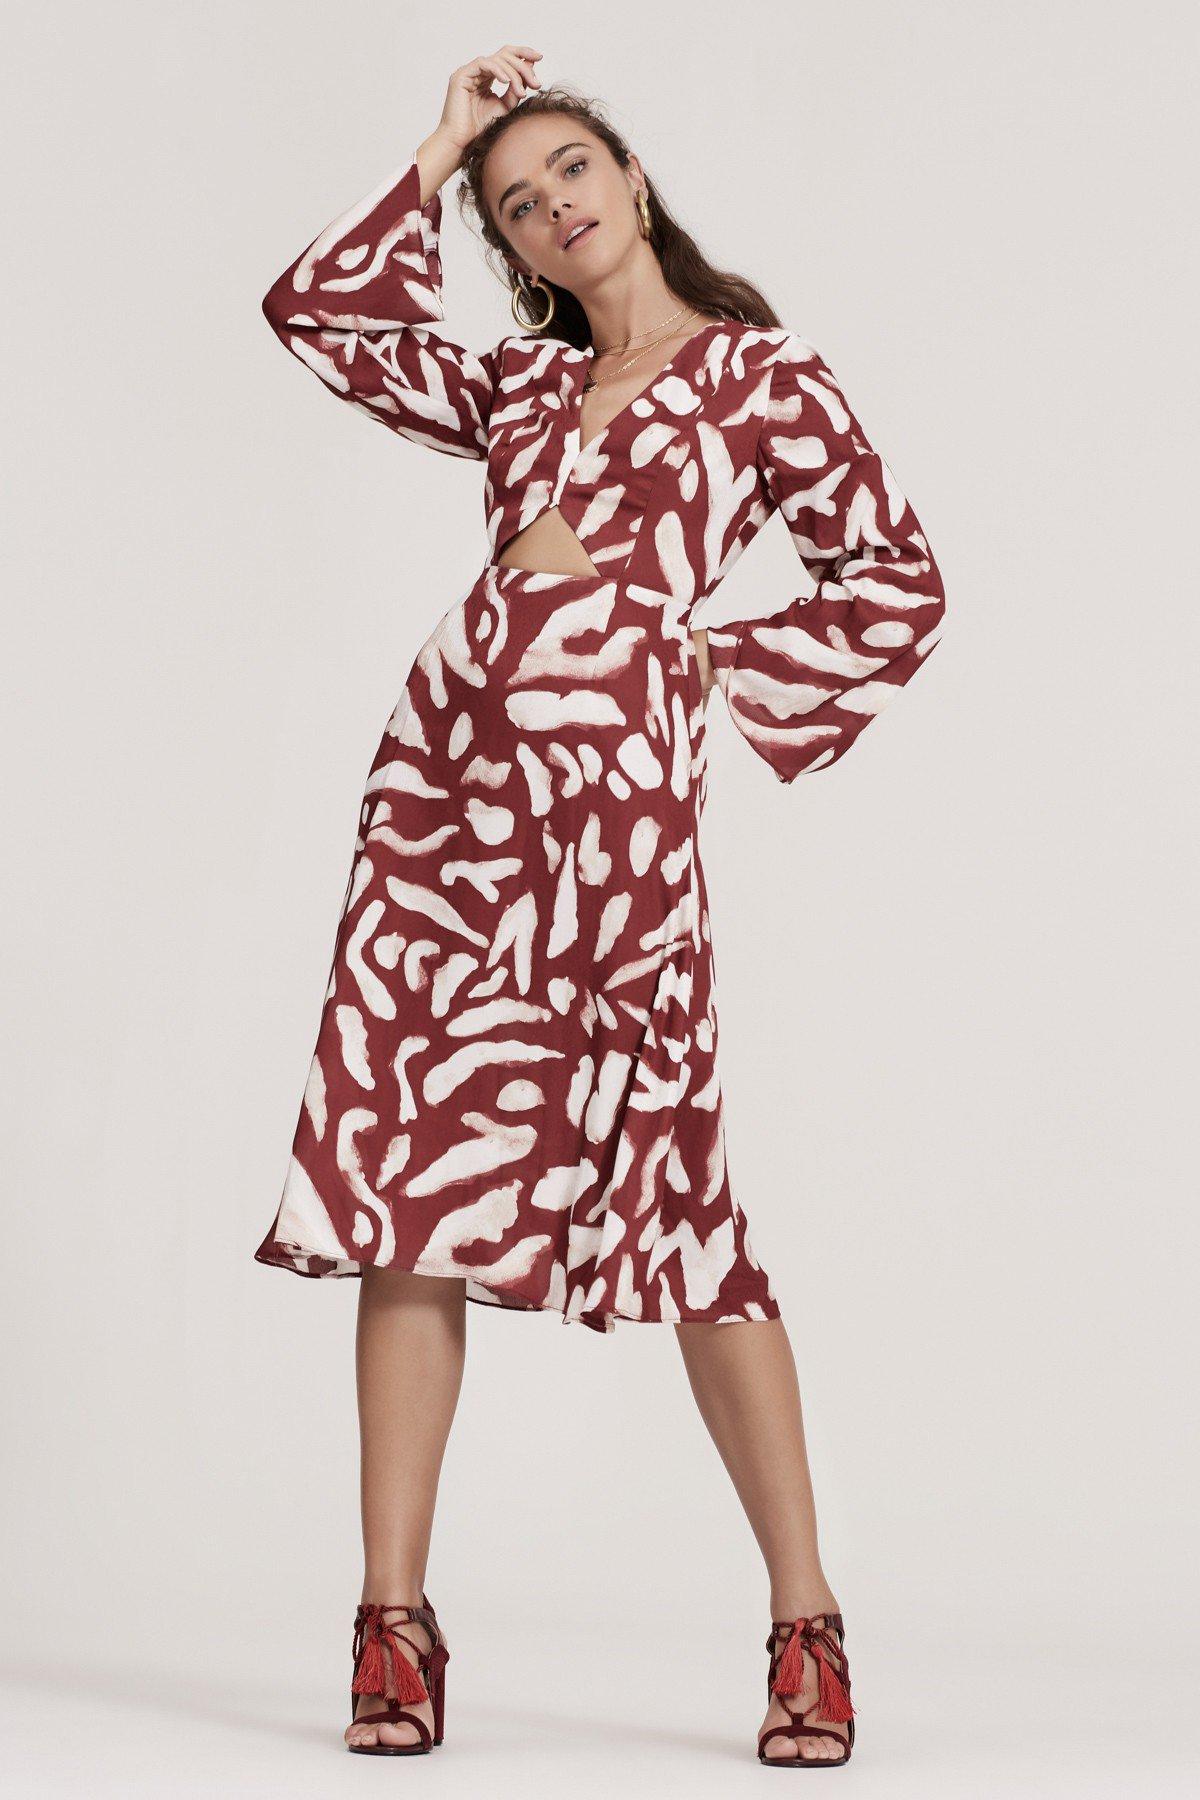 Shop Finders Mercurial Dress.